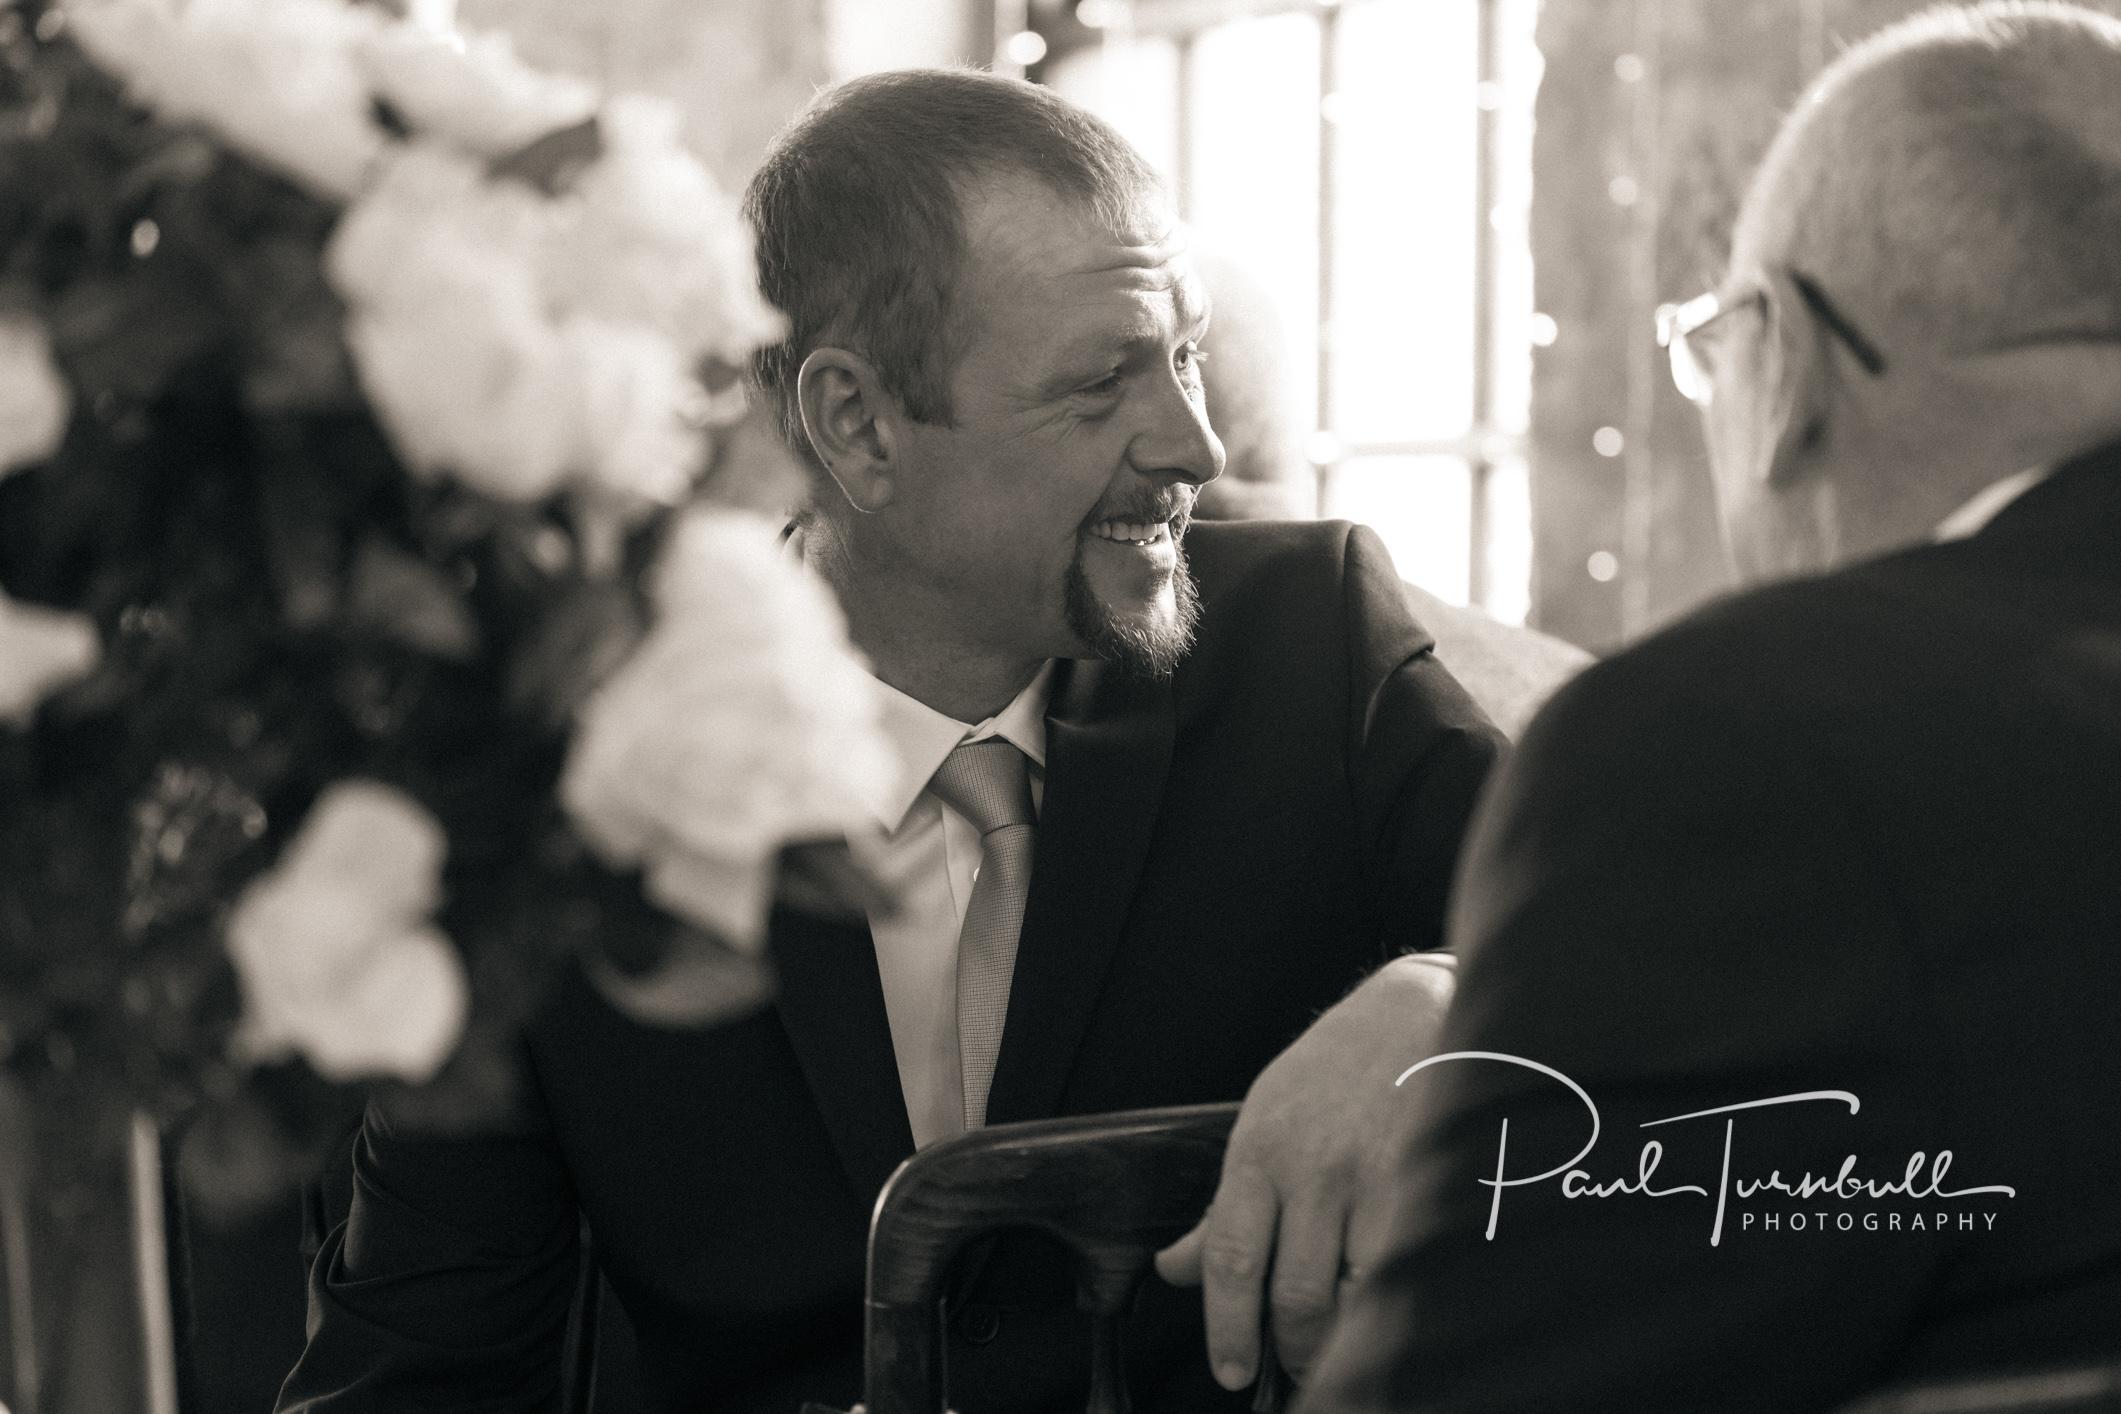 wedding-photographer-raven-hall-ravenscroft--scarborough-yorkshire-lucy-ryan-028.jpg